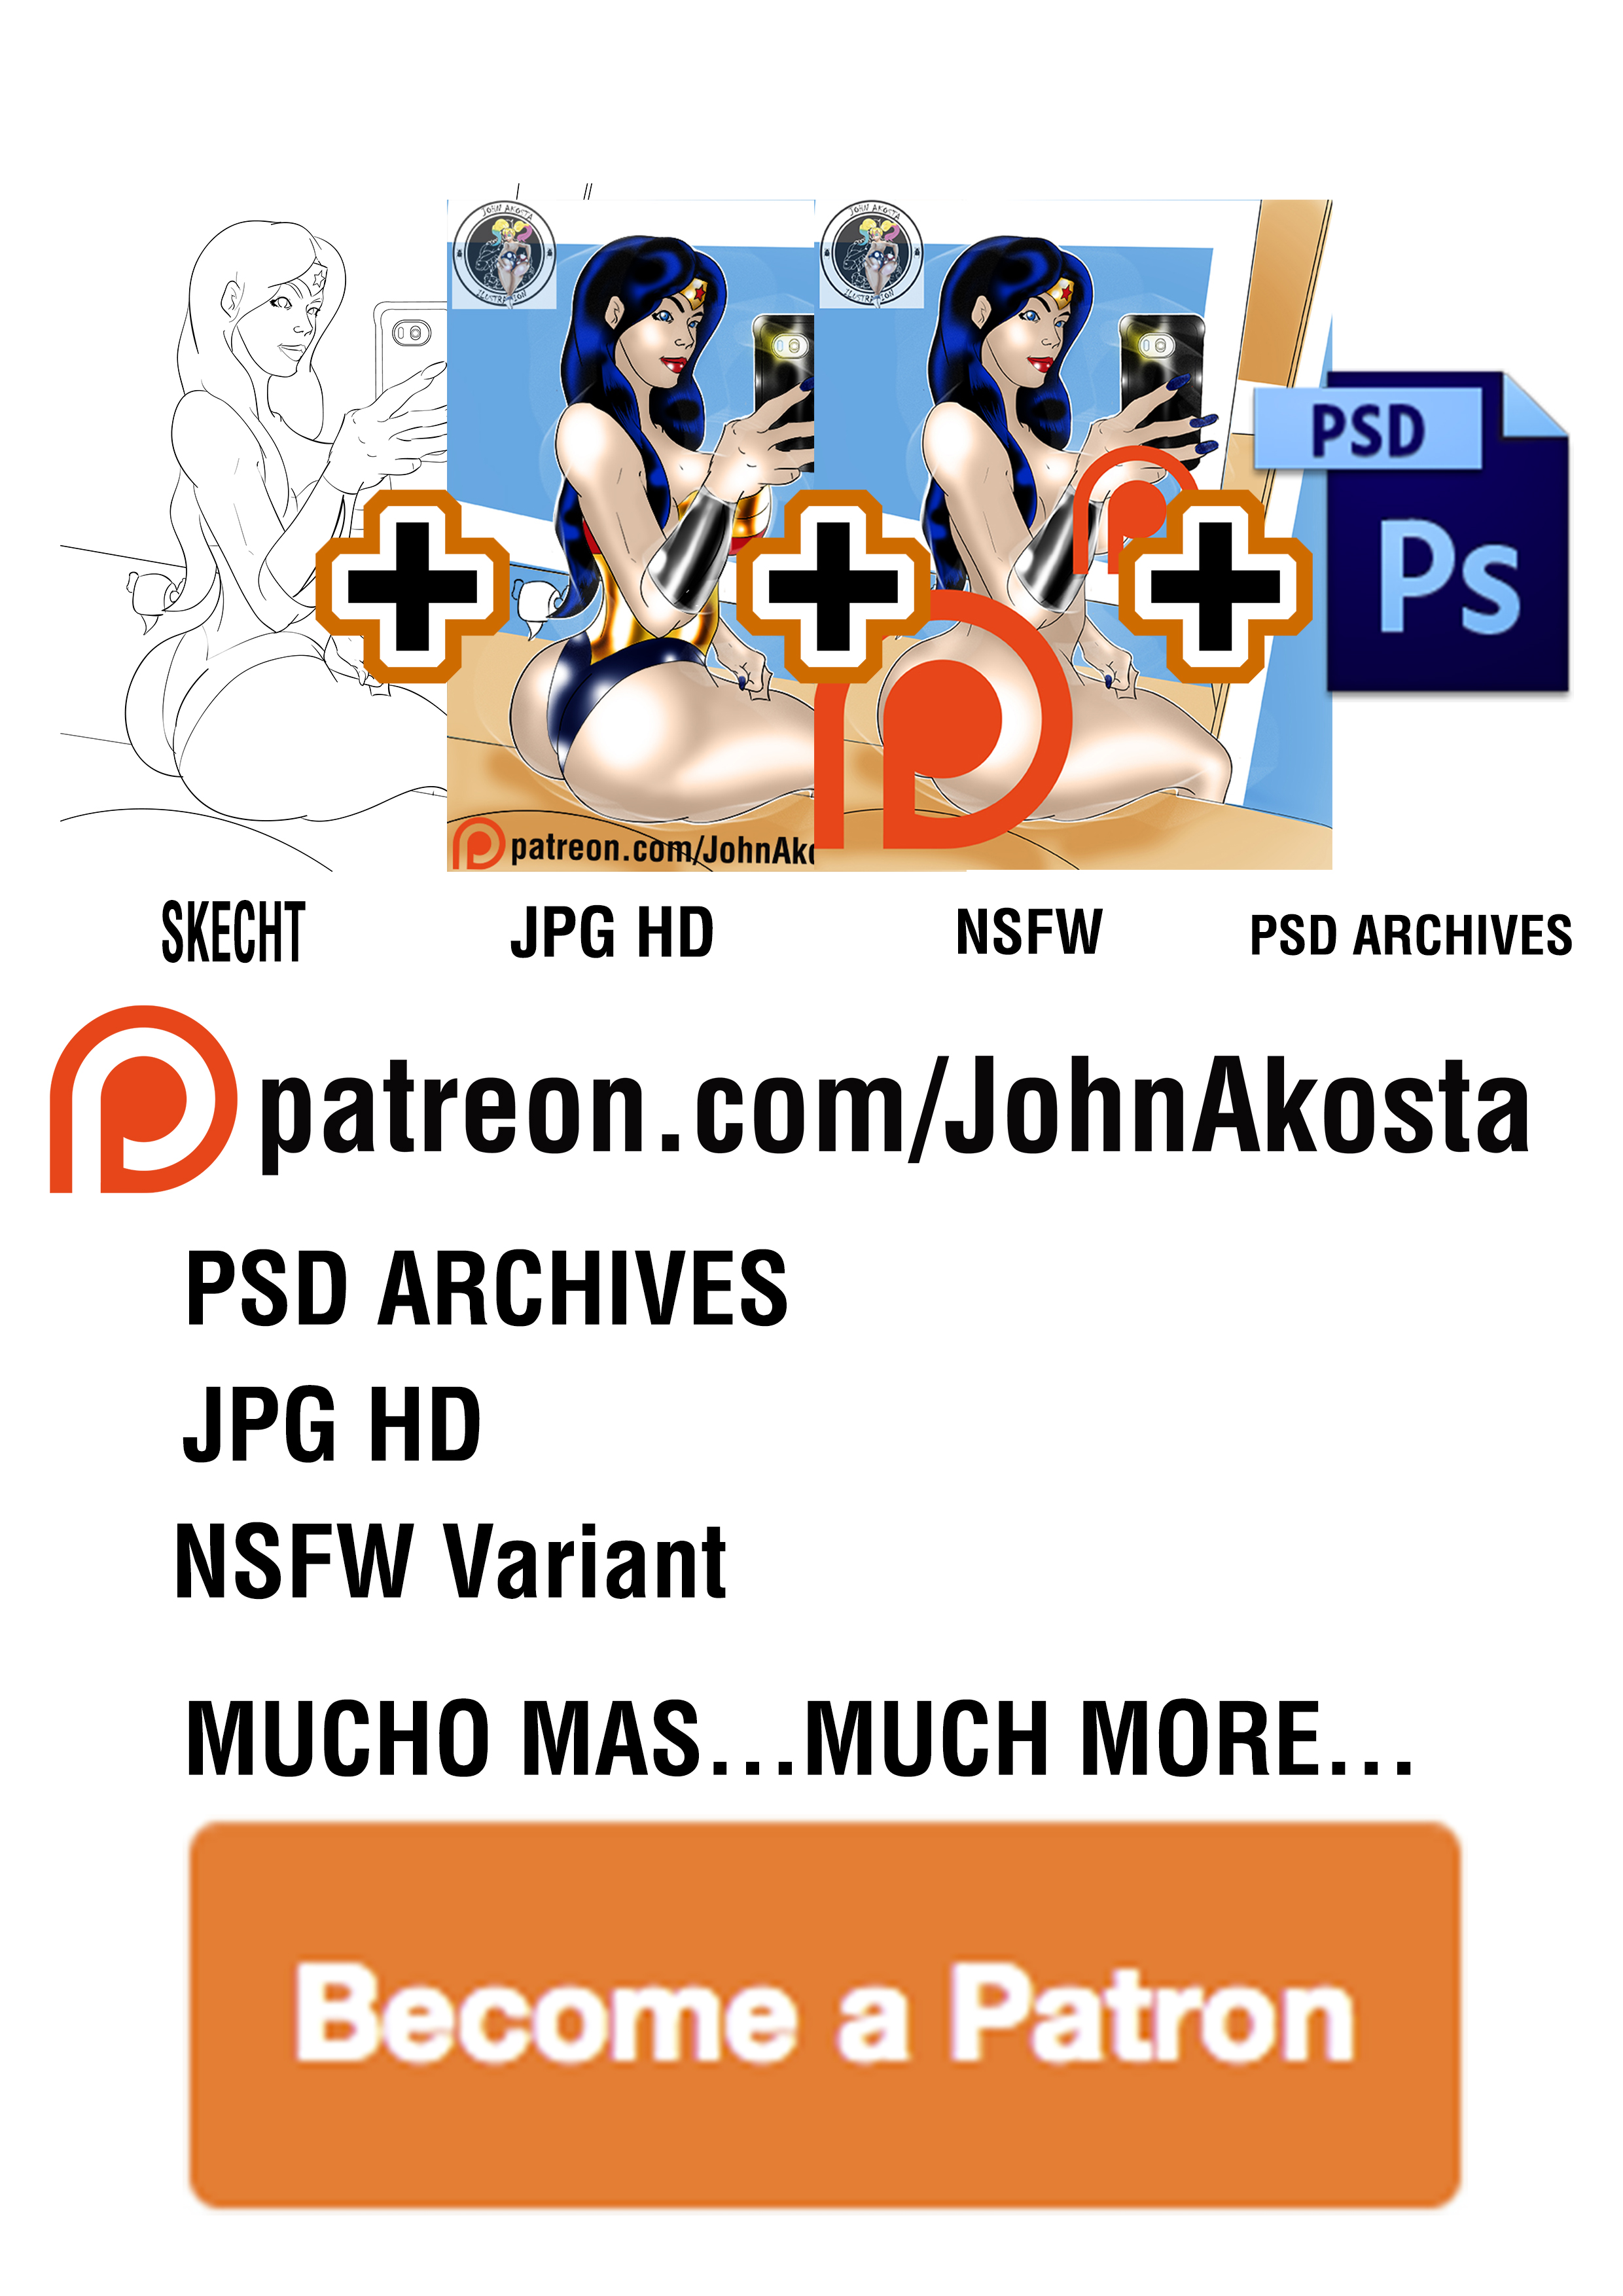 rewards patreon